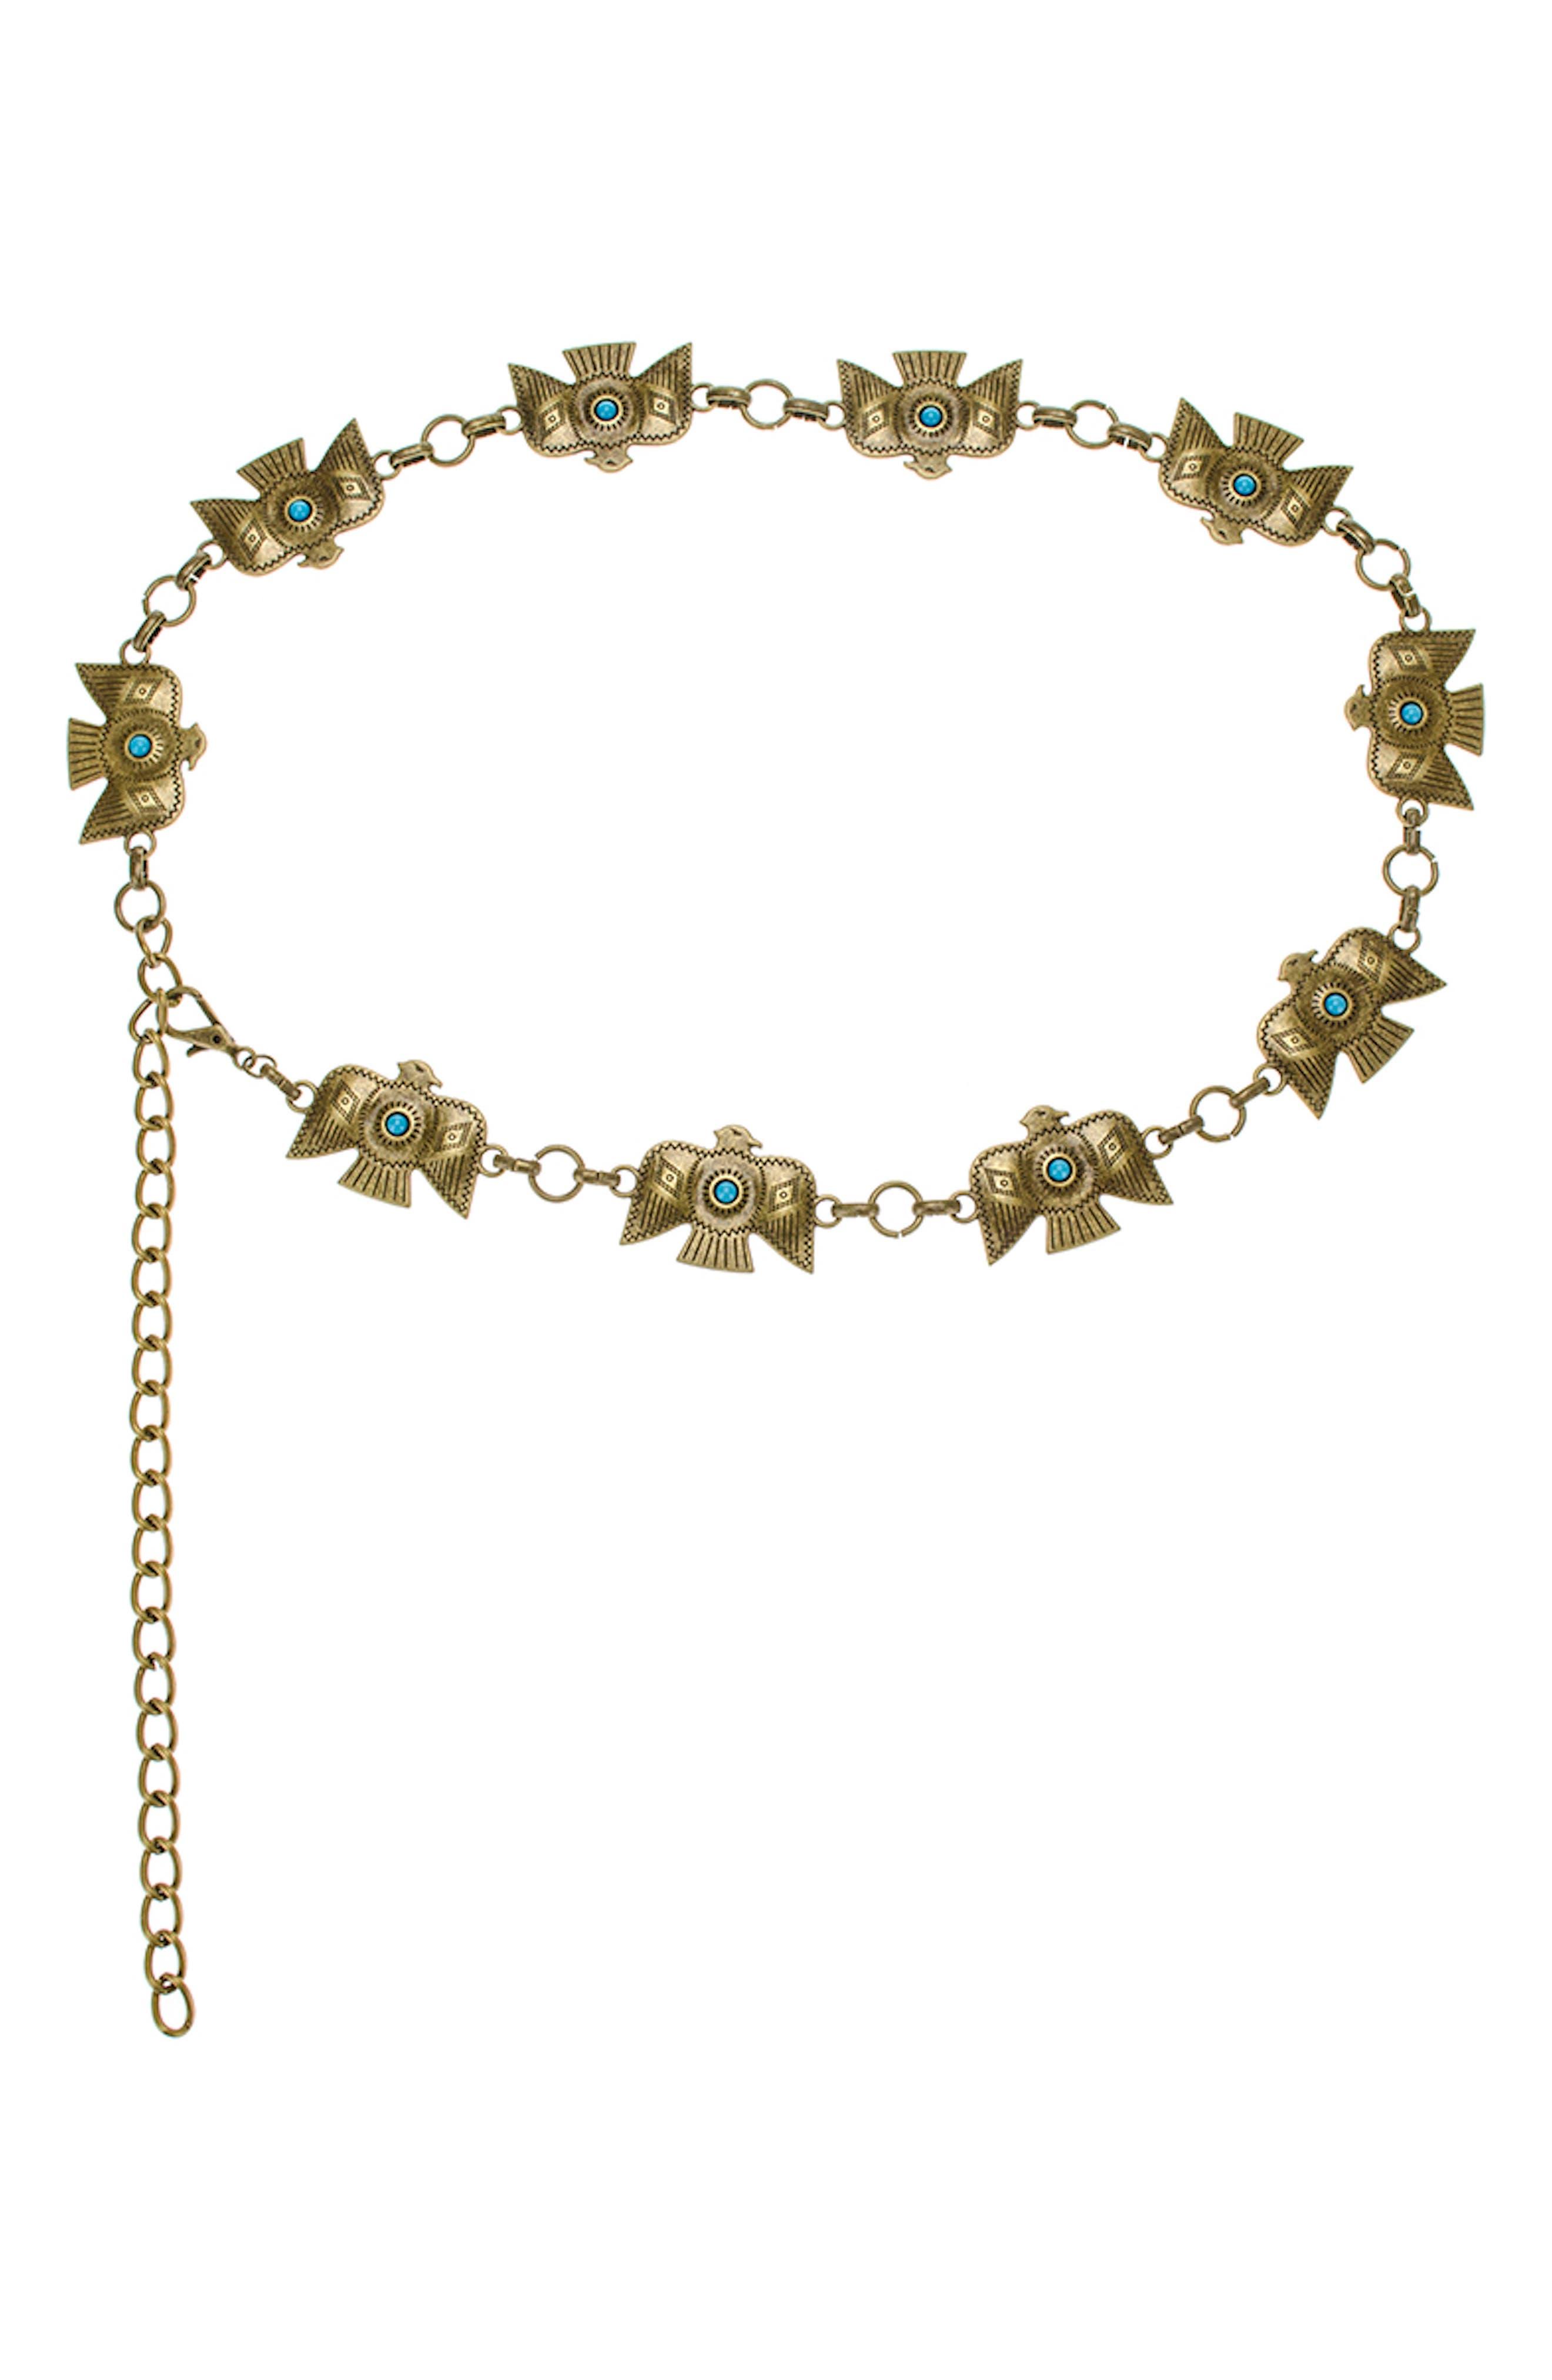 Lovestrength Zuni Turquoise Thunderbird Chain Belt